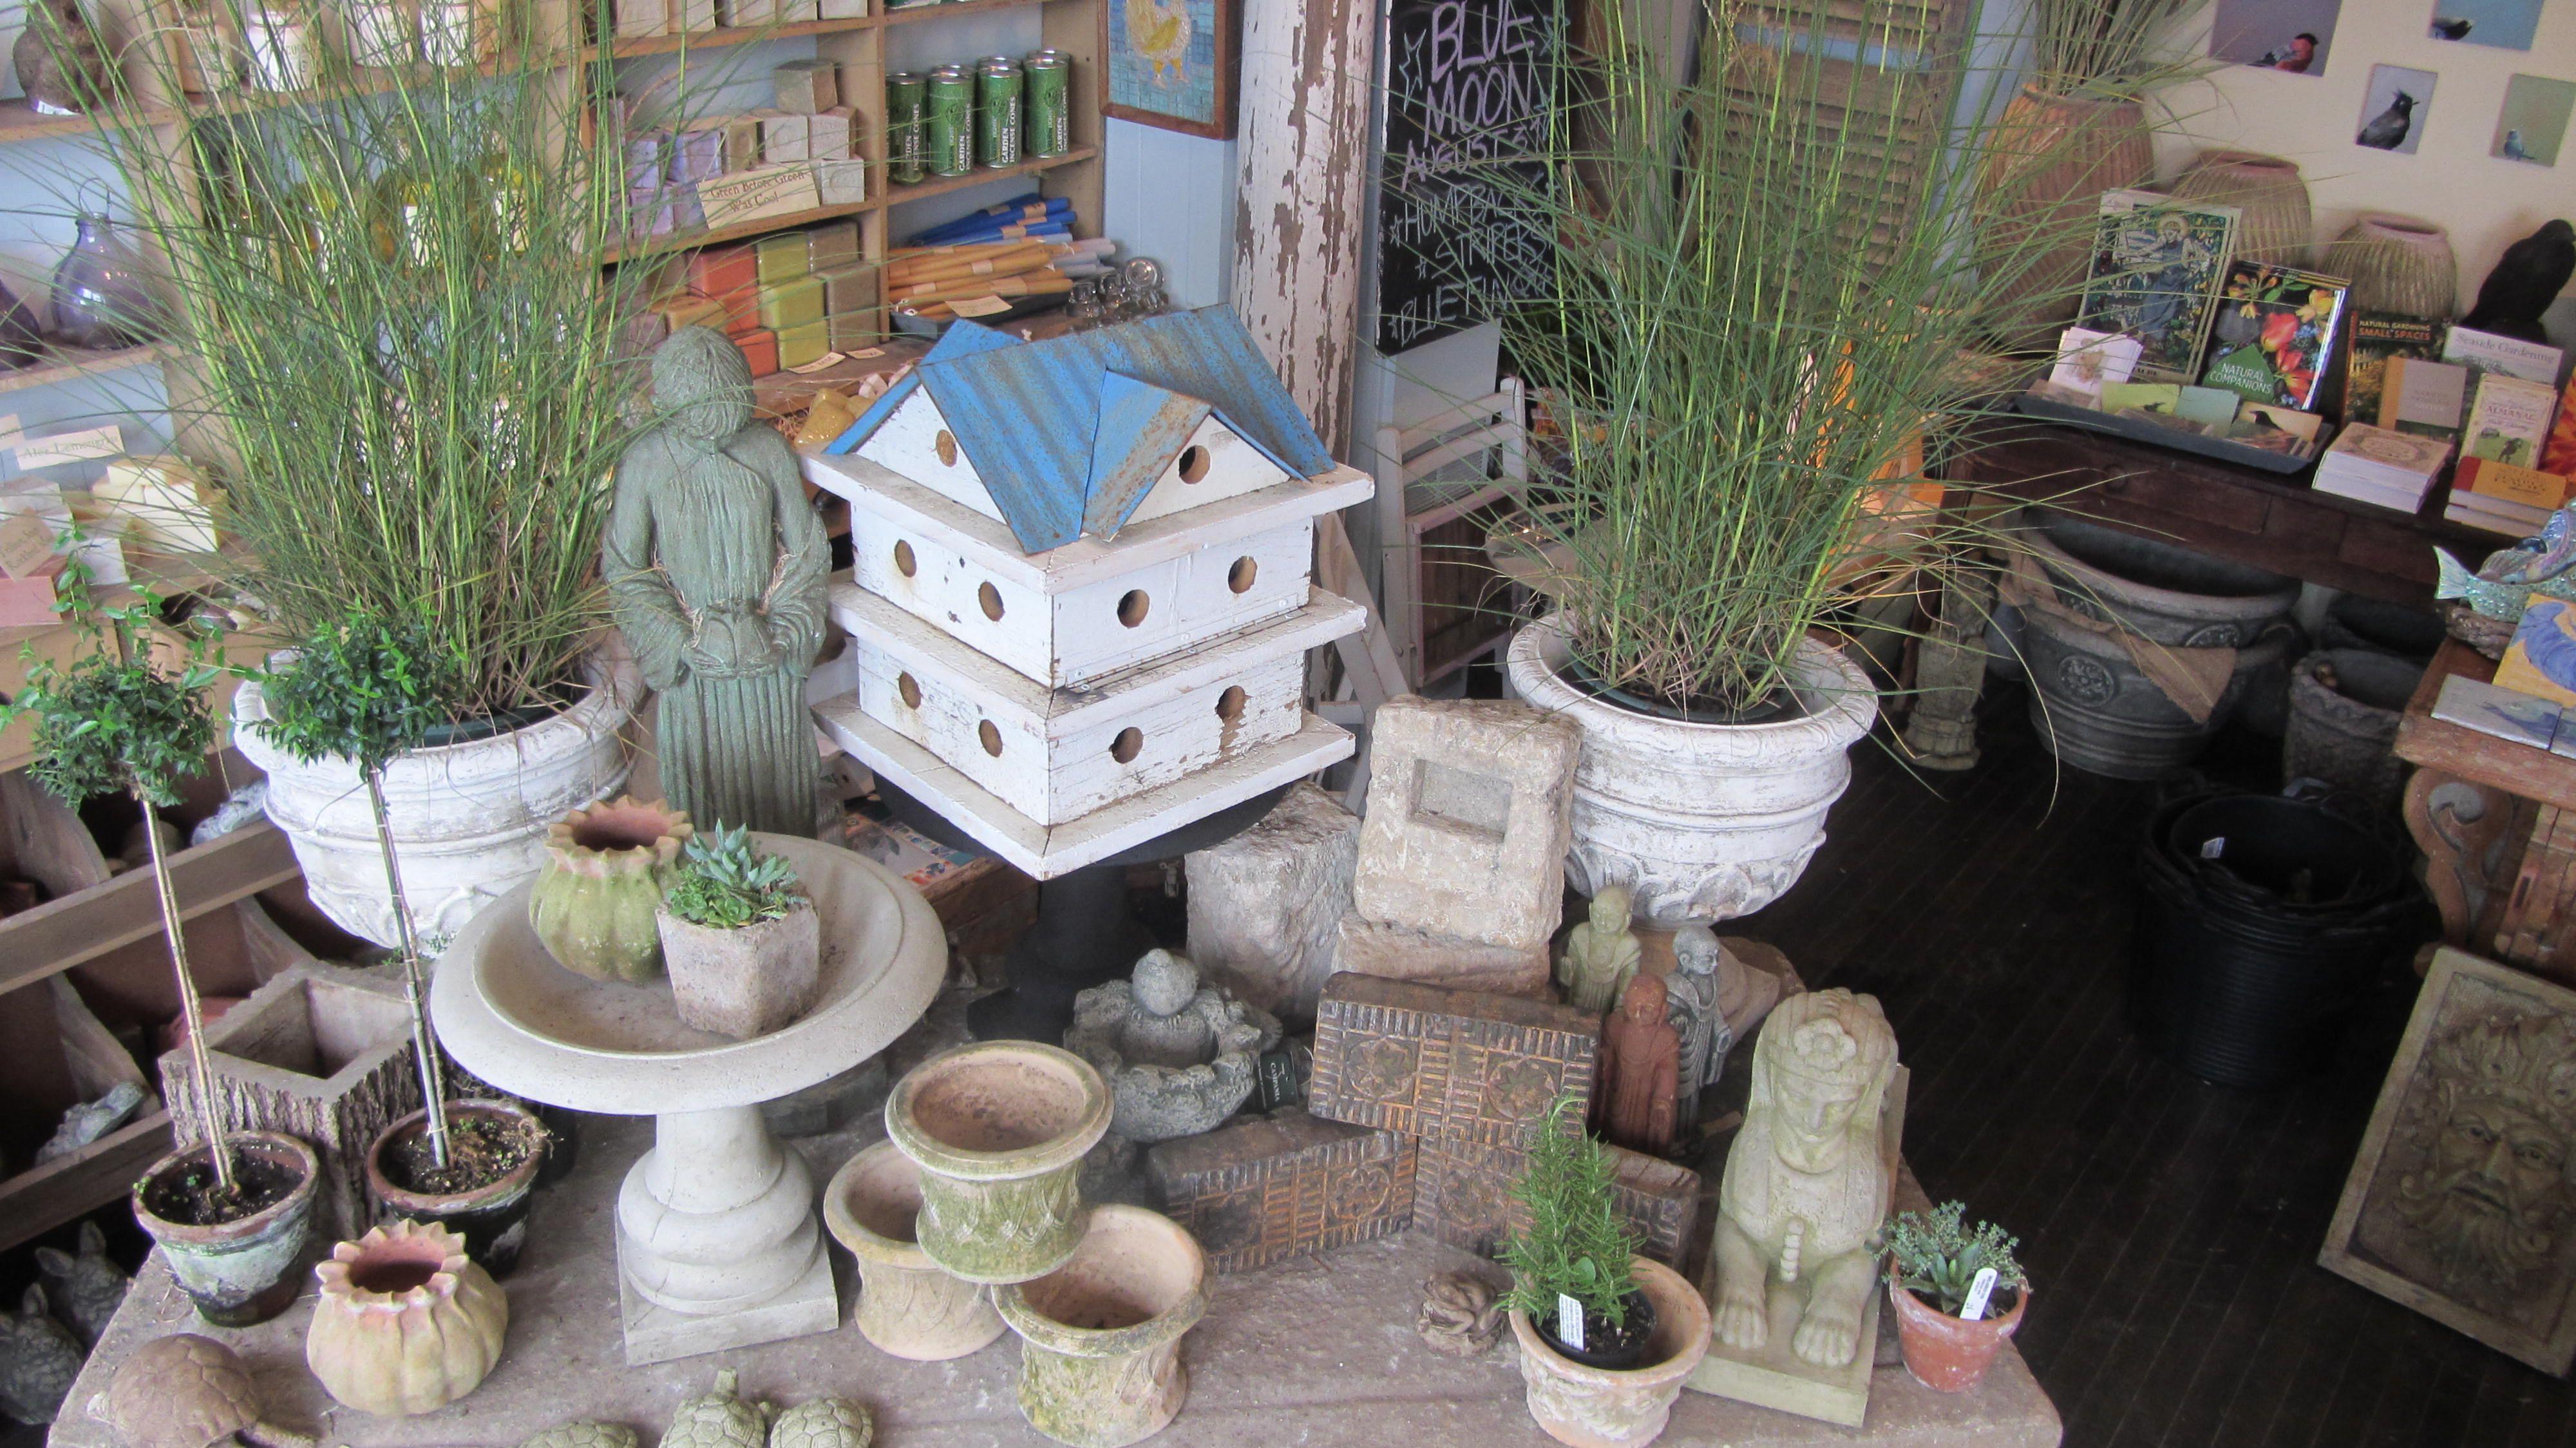 Fiachre a boutique garden gift shop portland maine